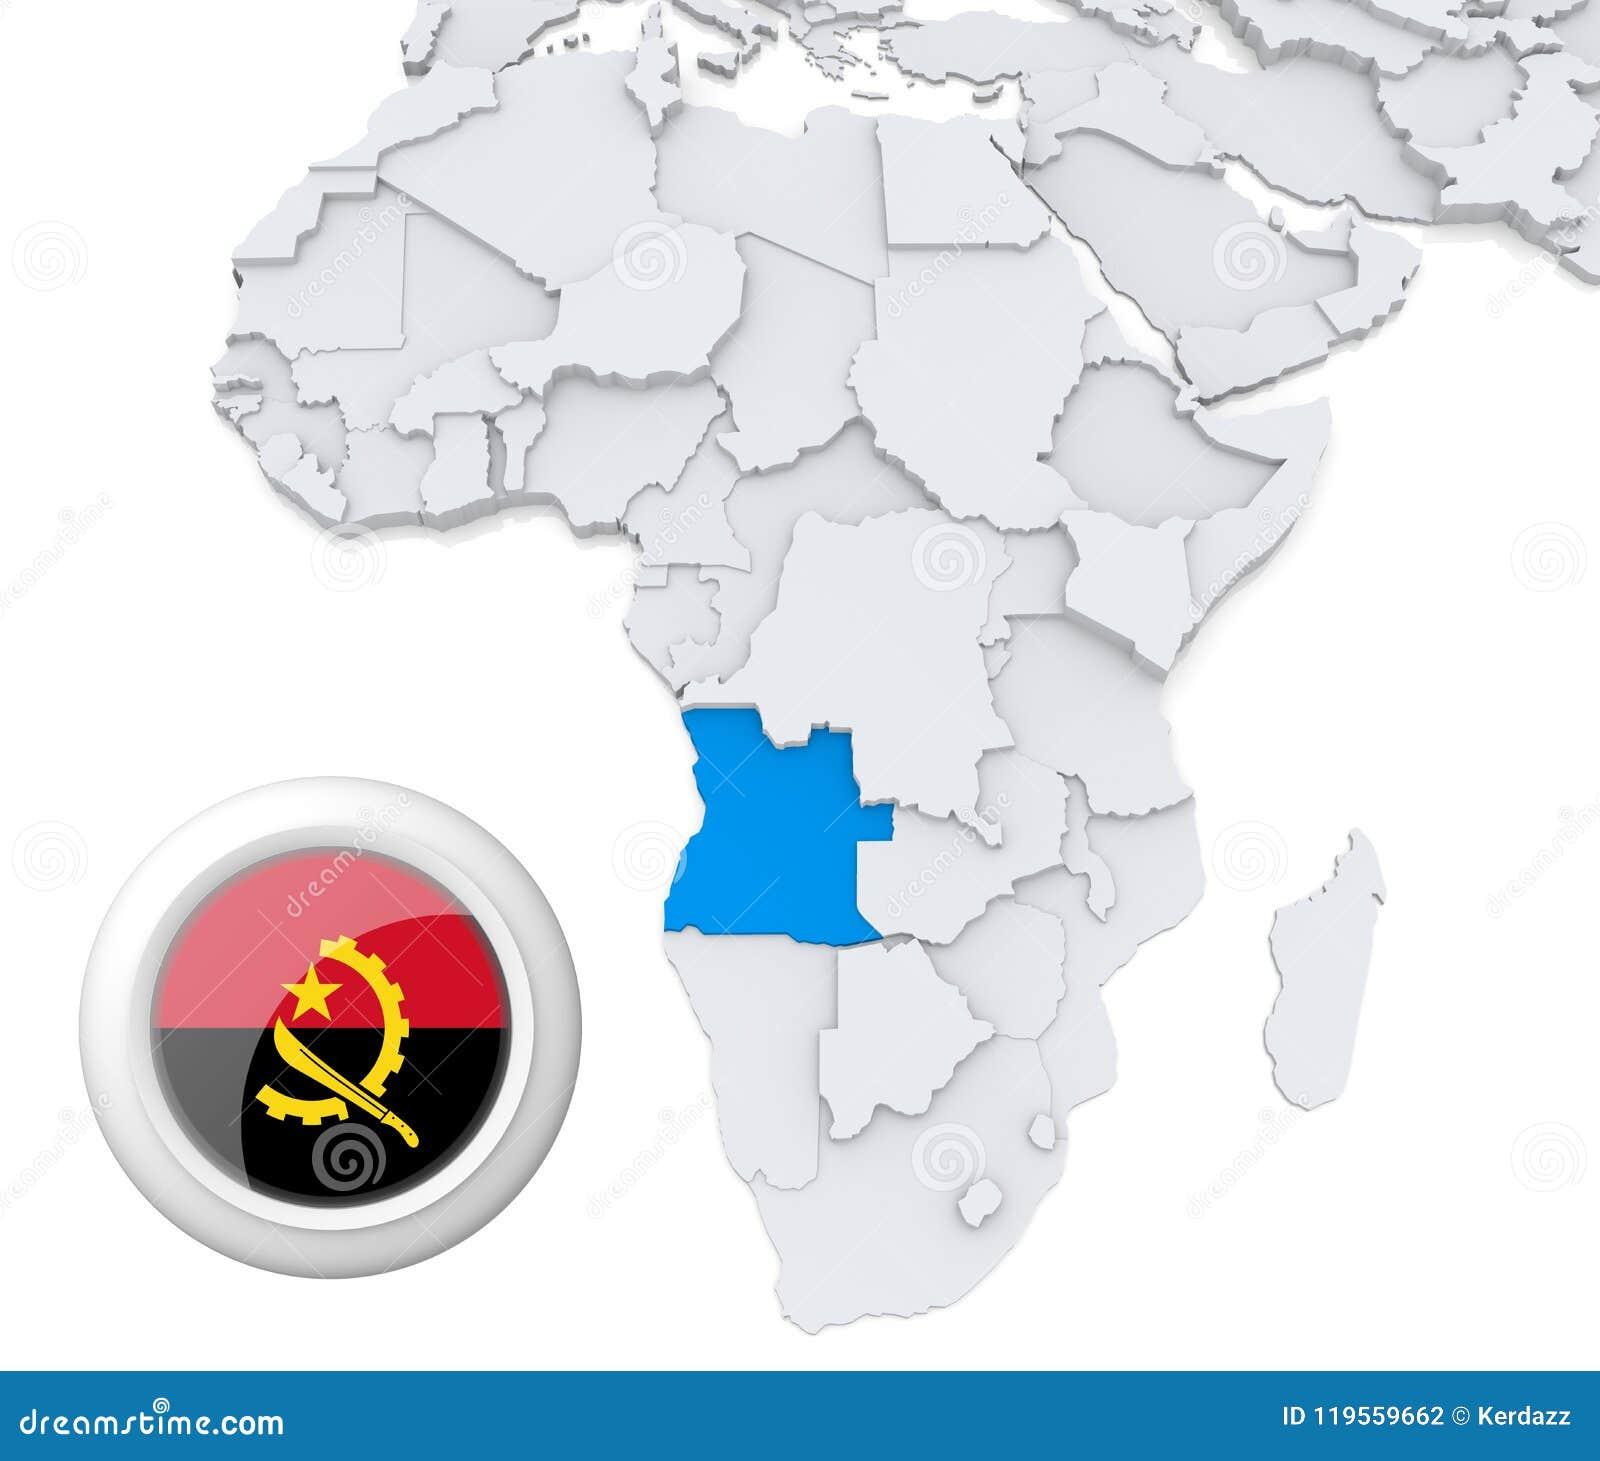 Africa Map Angola.Angola On Africa Map Stock Illustration Illustration Of Politics